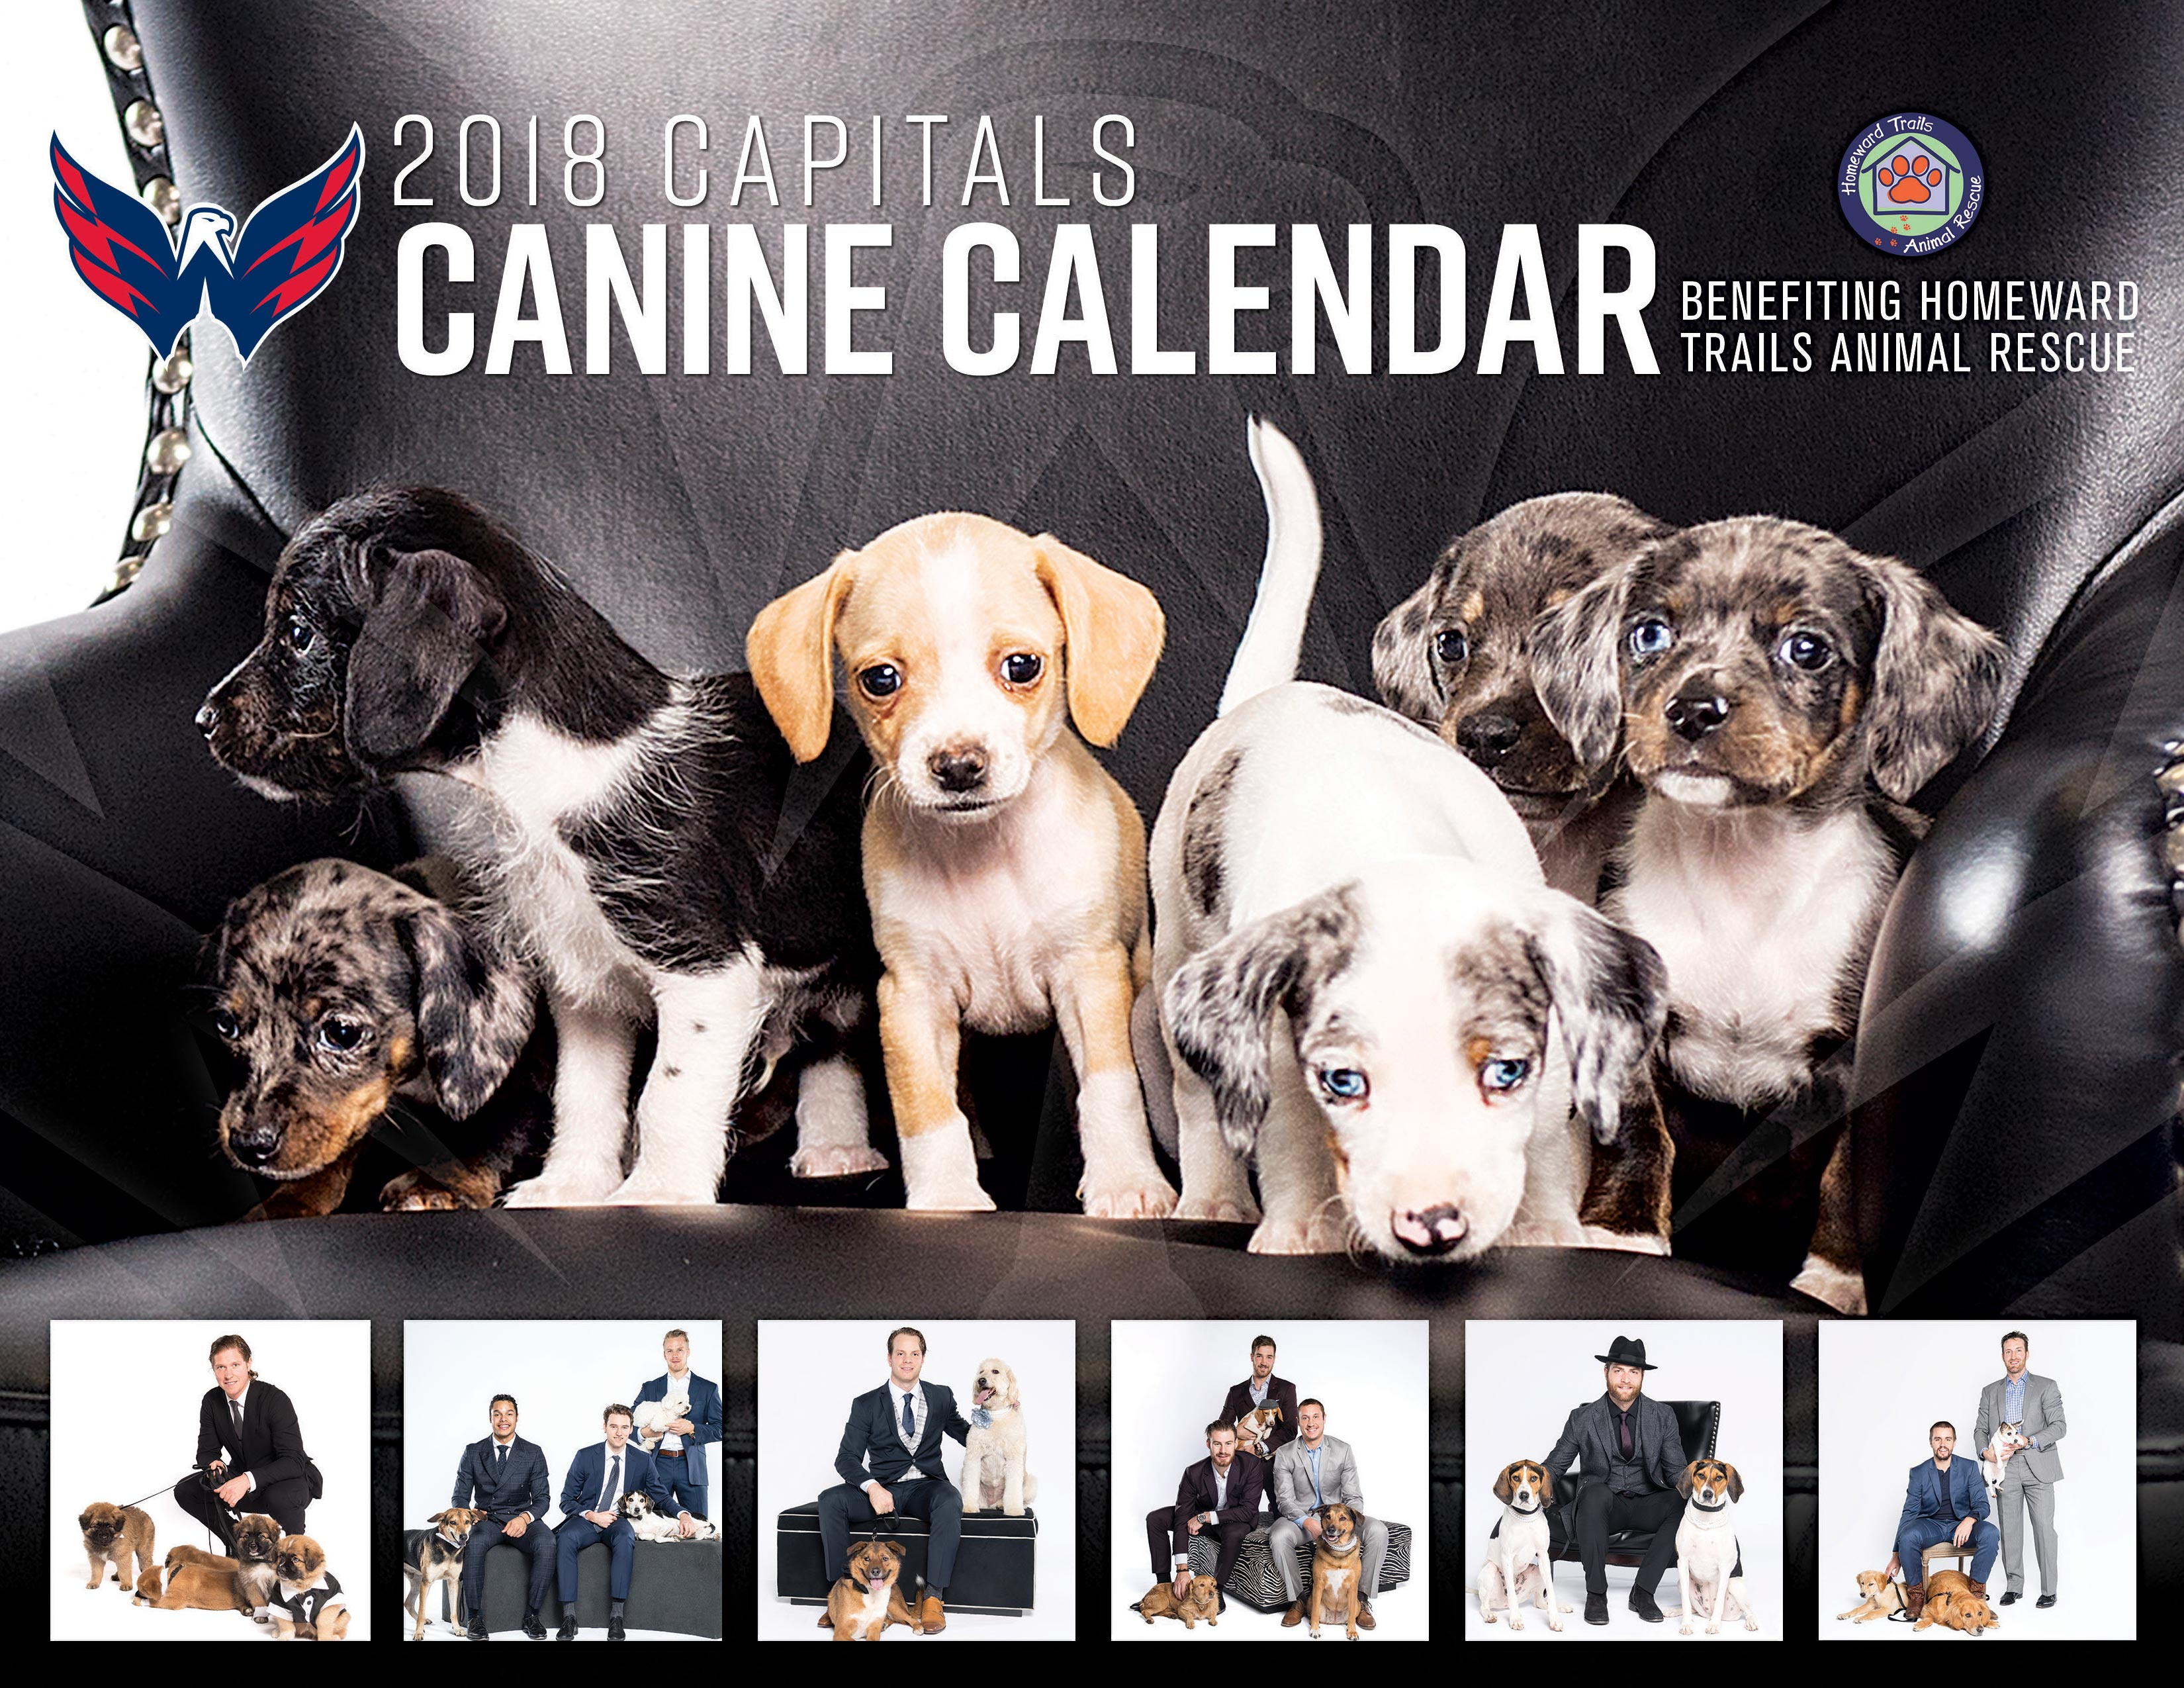 Canine-calendar-cover